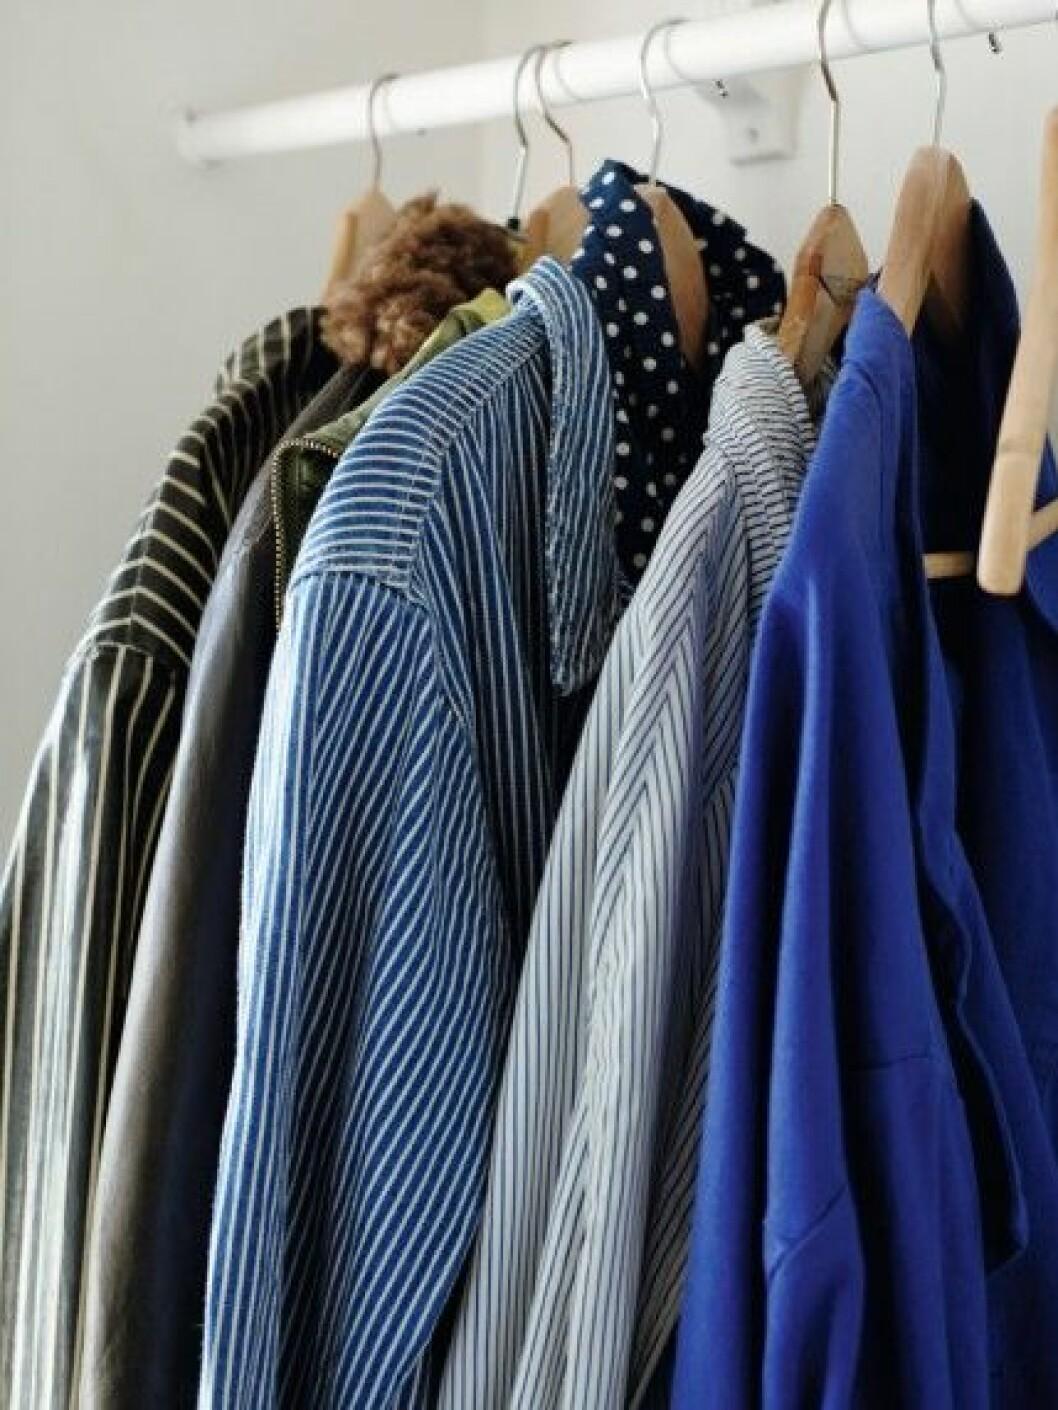 Foto-Pia-Ulin-Cilla-Ramnek-galgar-garderob-skjortor